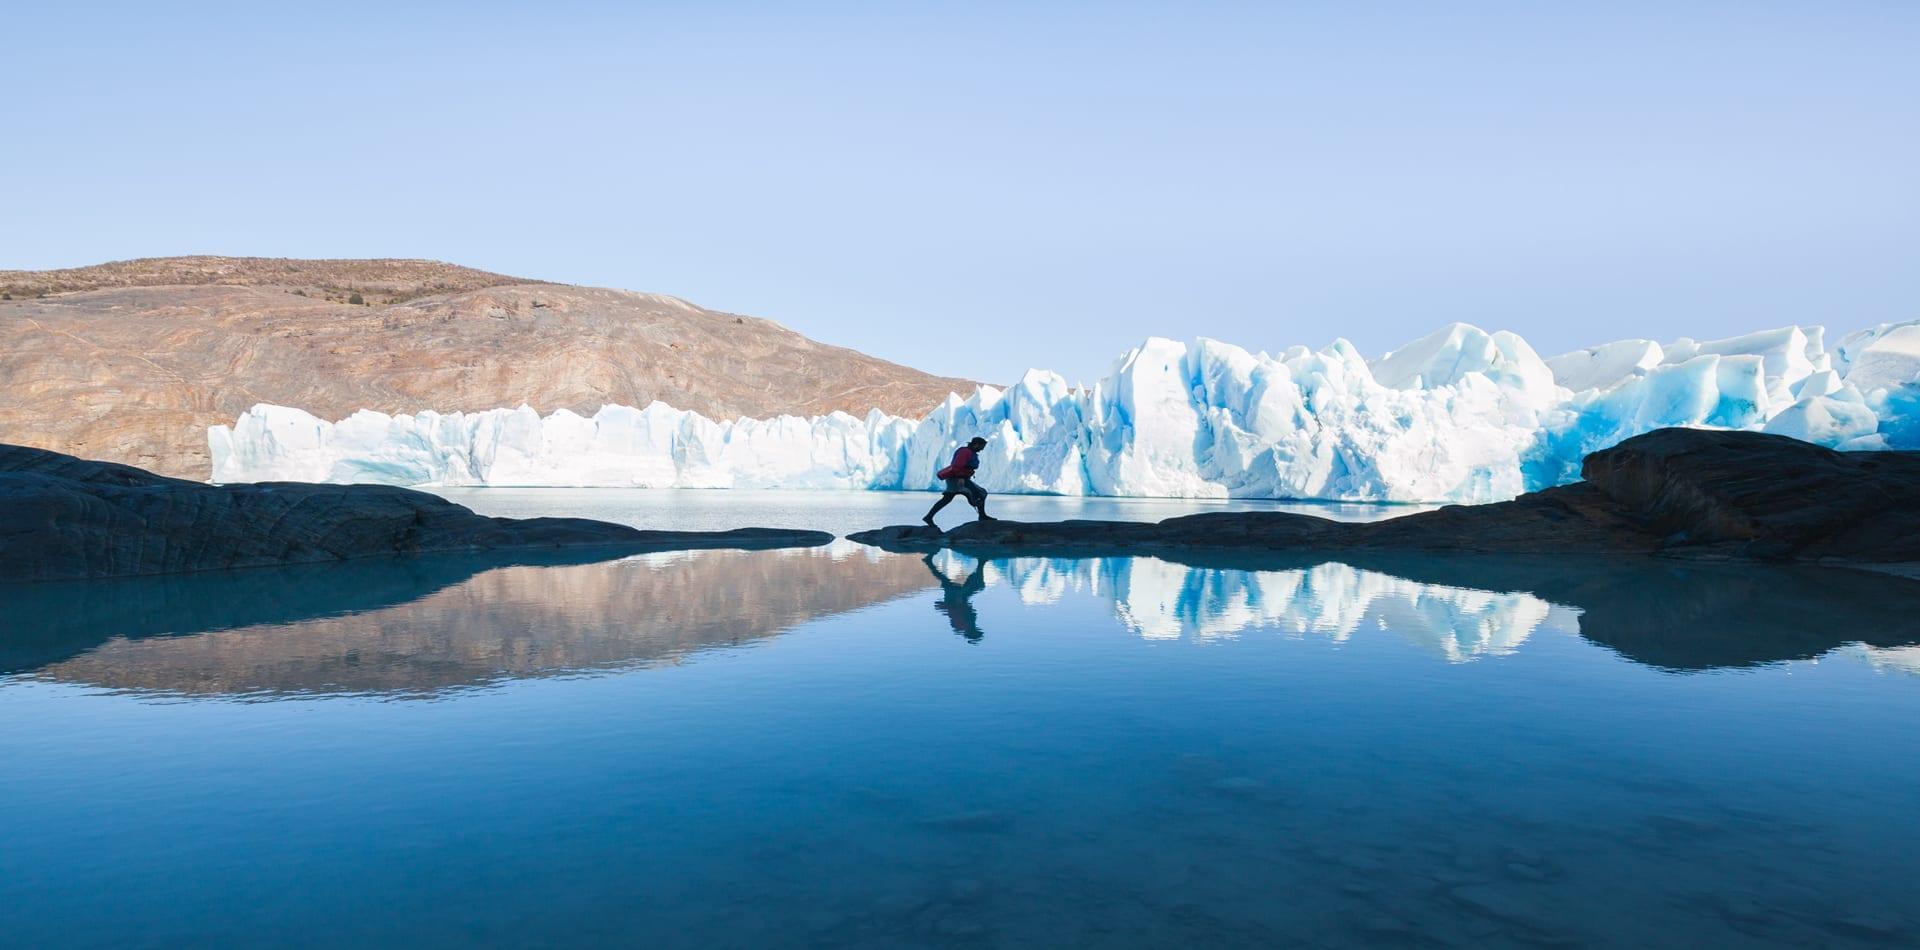 Hiking in Patagonia Argentina